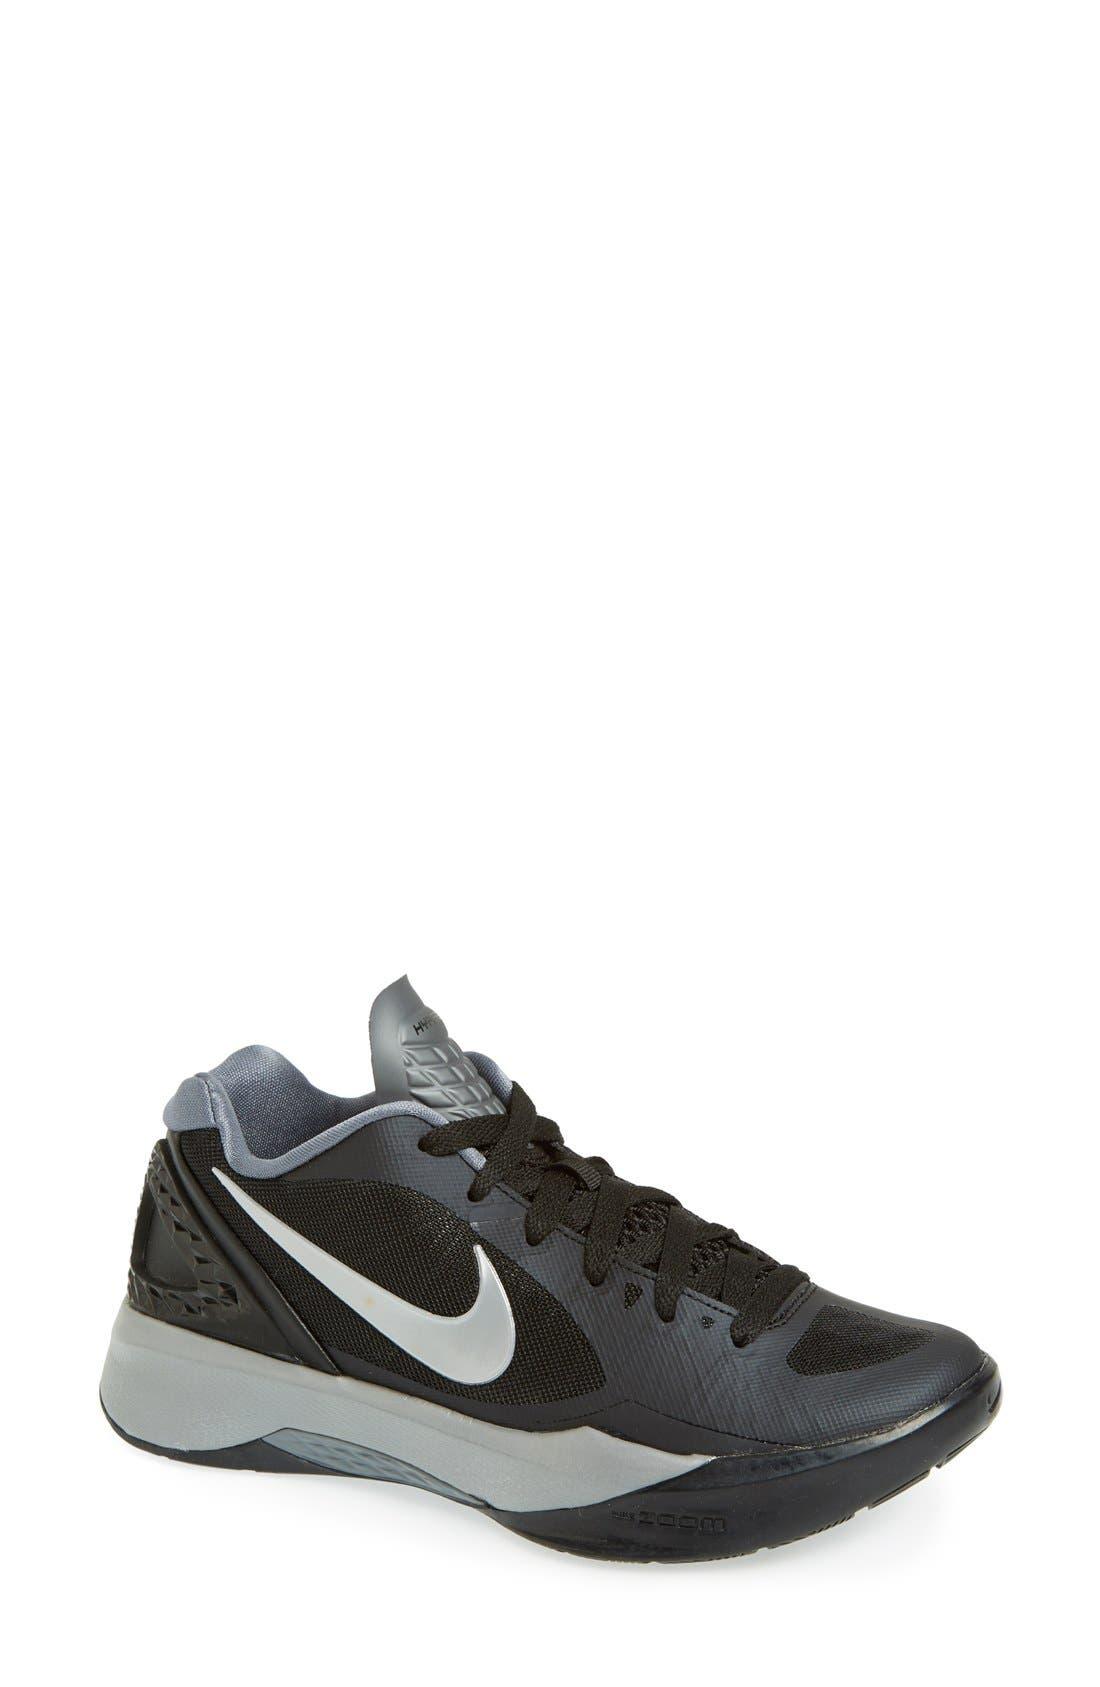 Main Image - Nike 'Zoom Hyperspike' Volleyball Shoe (Women)